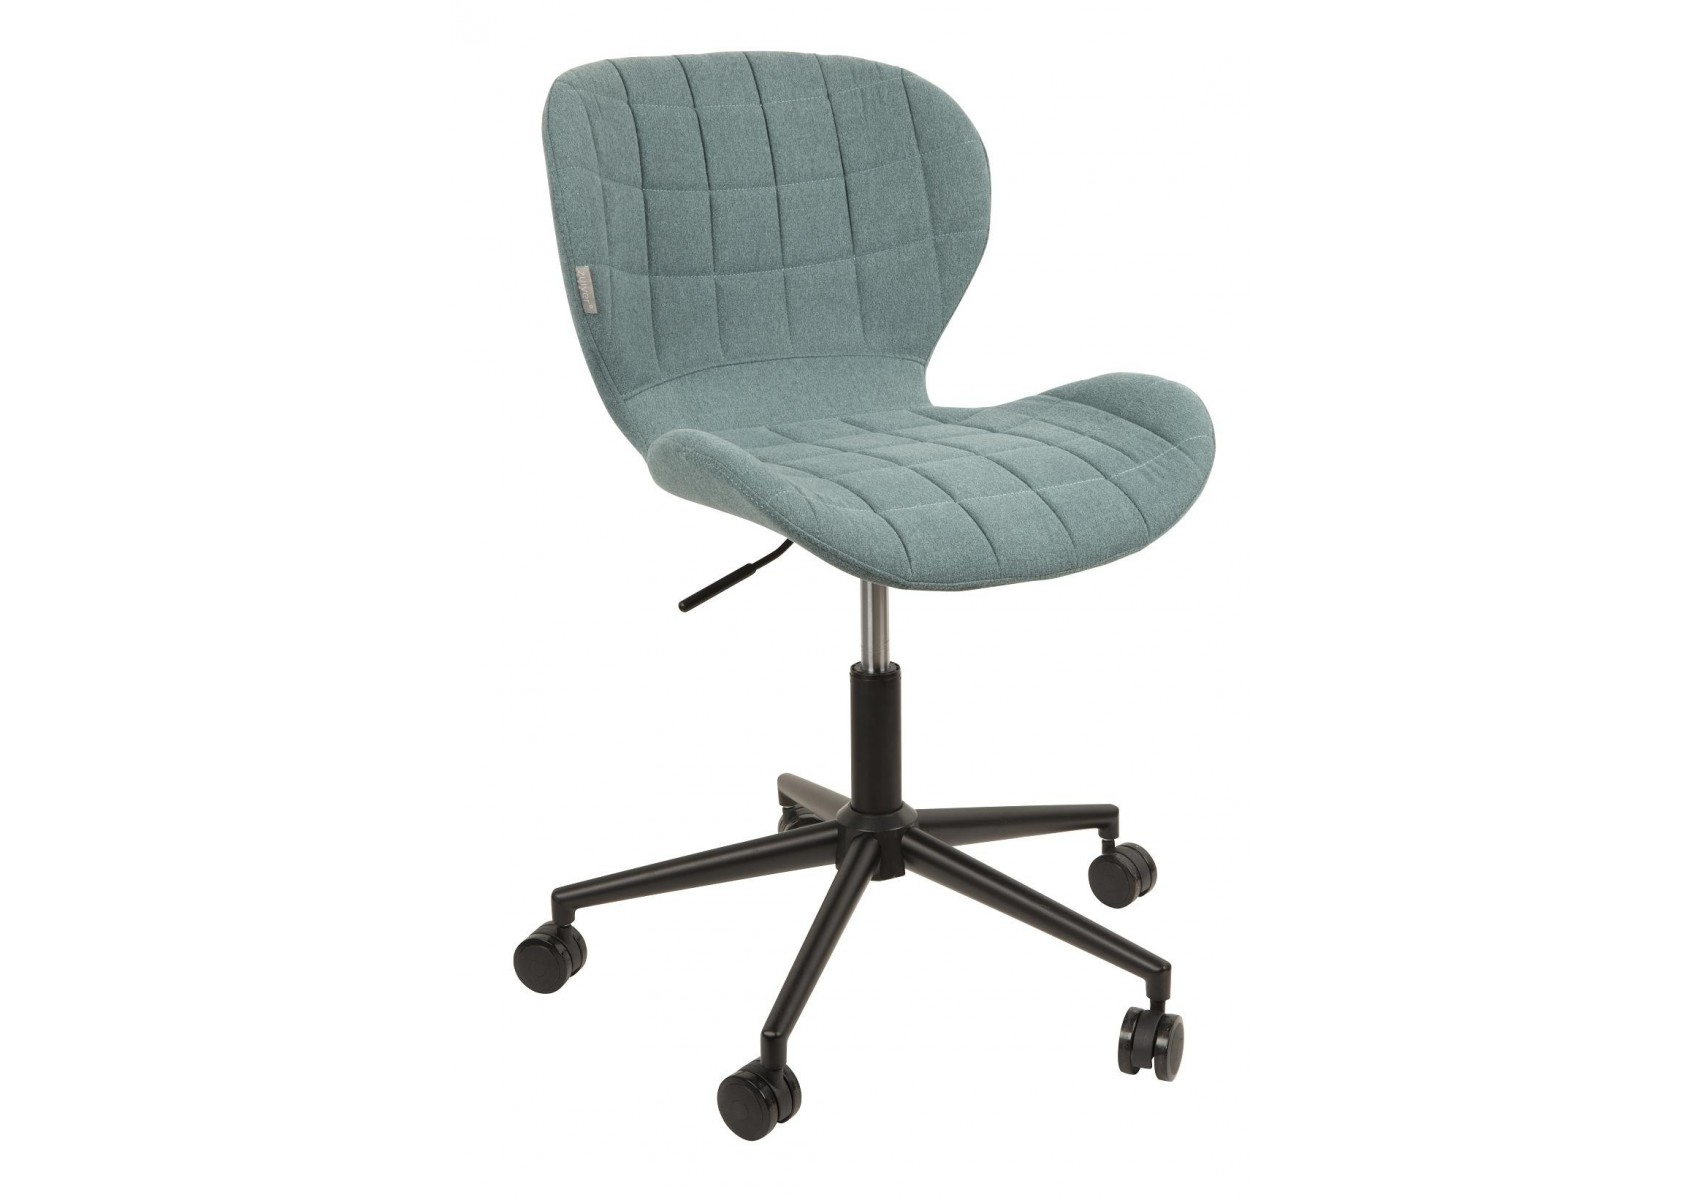 chaise de bureau design omg office zuiver boite design. Black Bedroom Furniture Sets. Home Design Ideas